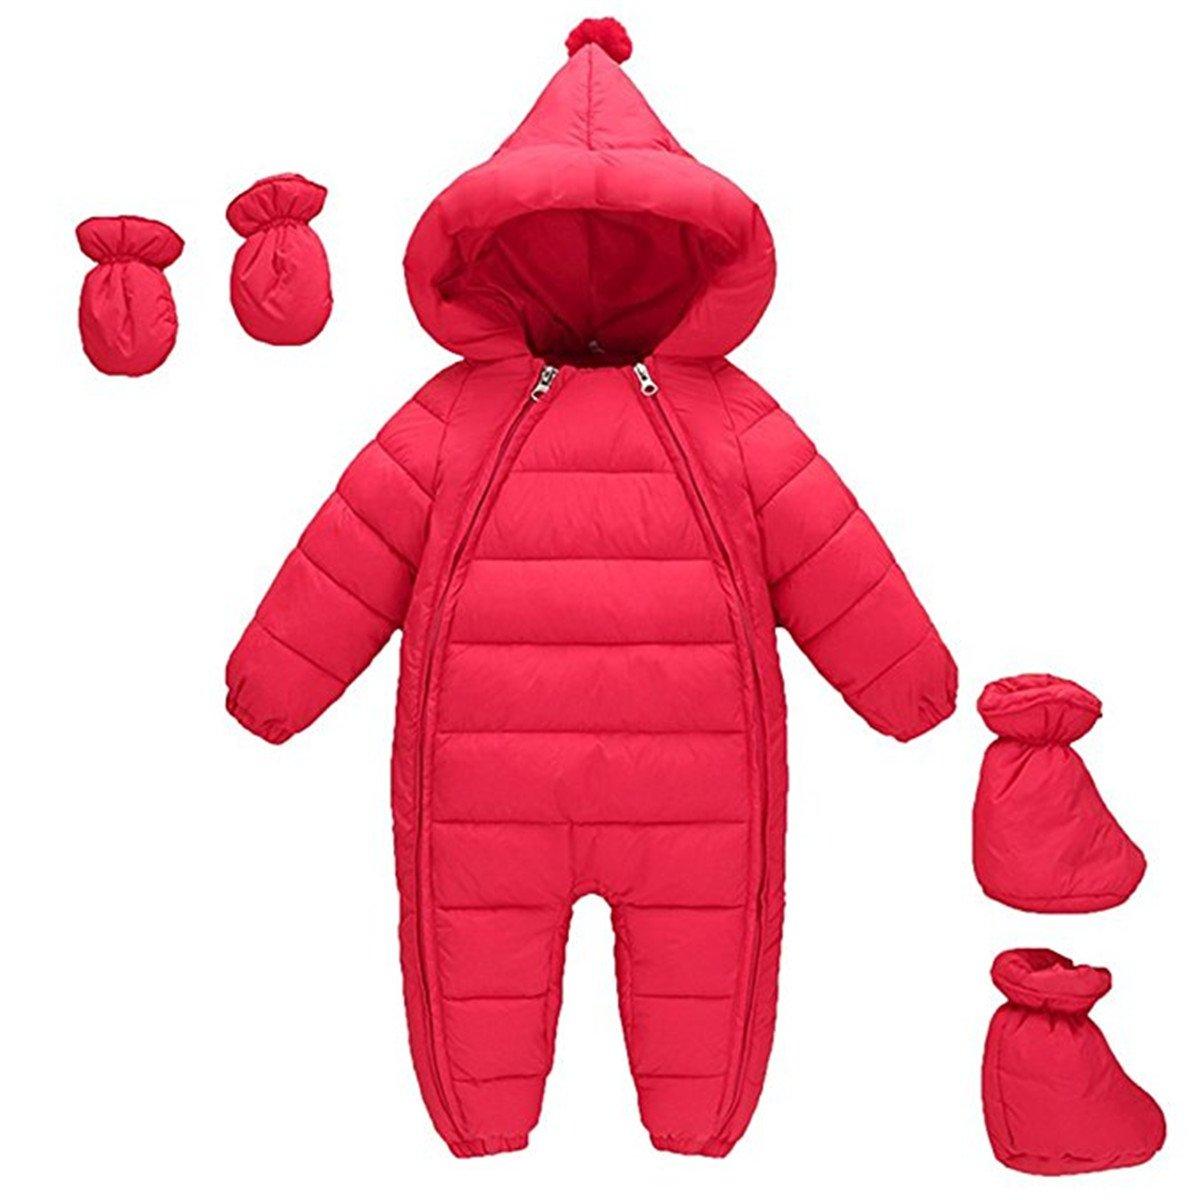 3Pcs Baby Girls Boys One Piece Zipper Down Jacket Winter Romper Jumpsuit Romper+Gloves+Shoes